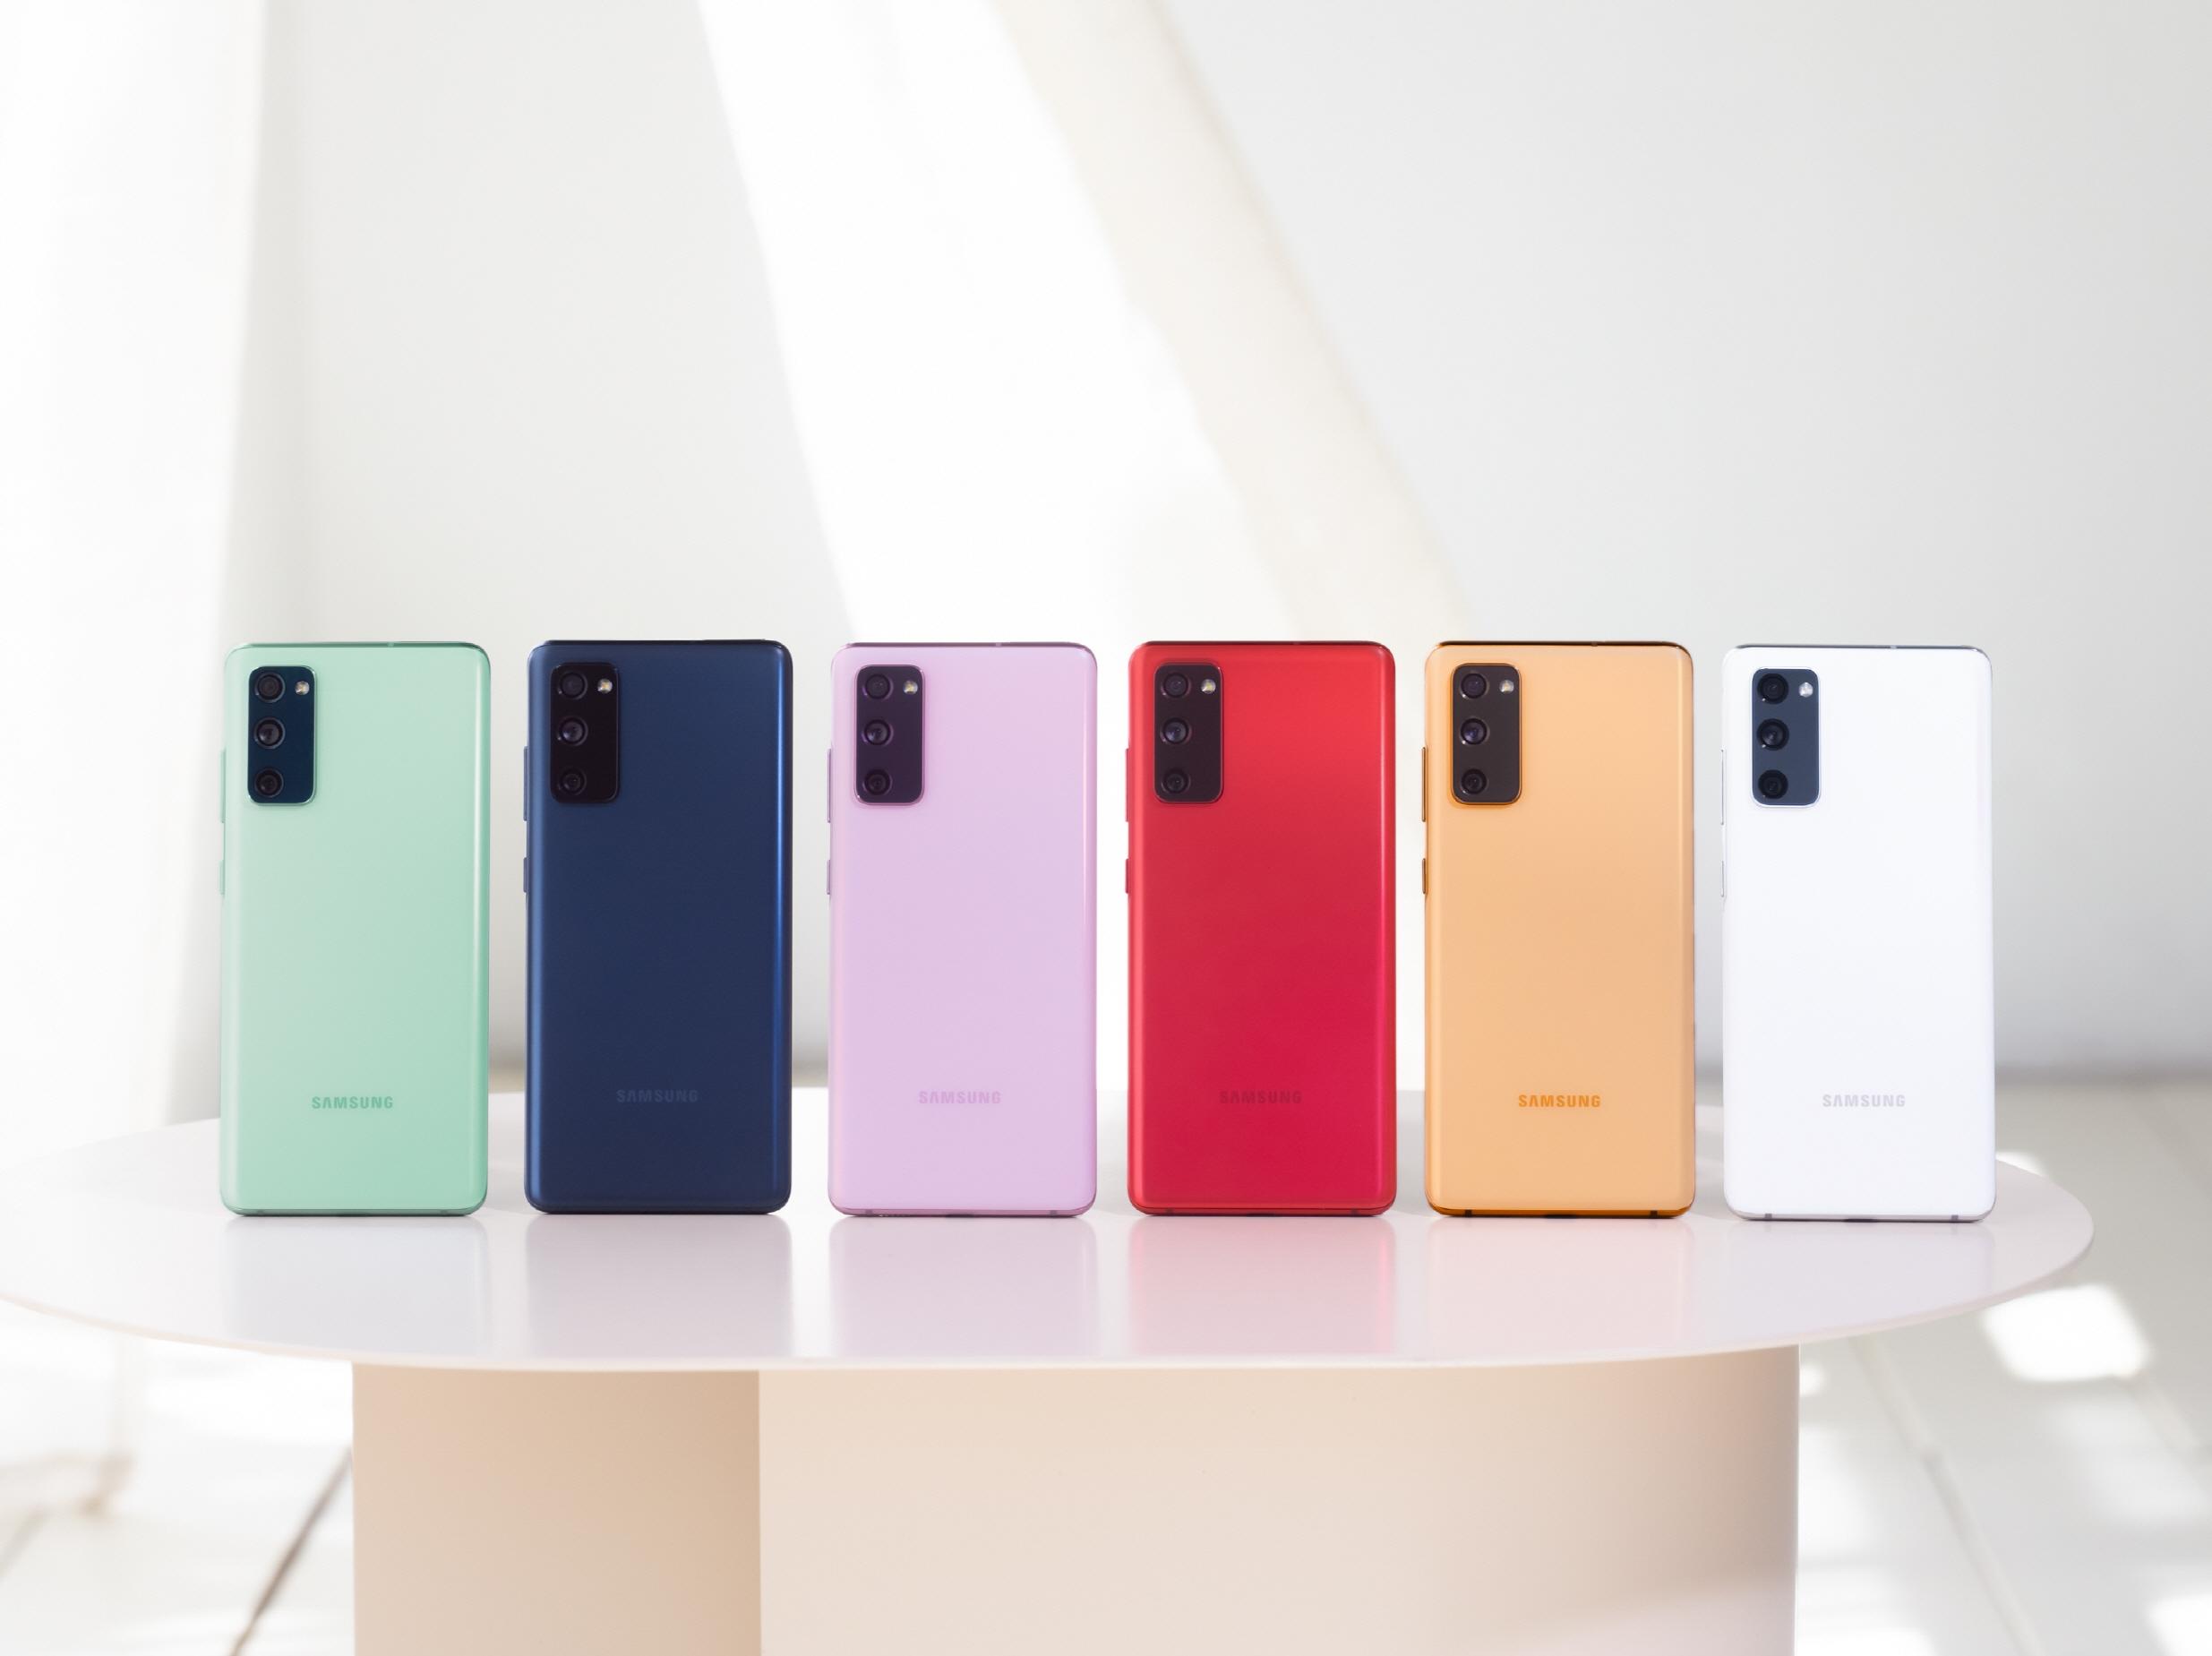 Samsung Galaxy S20 FE - sechs neue Trendfarben